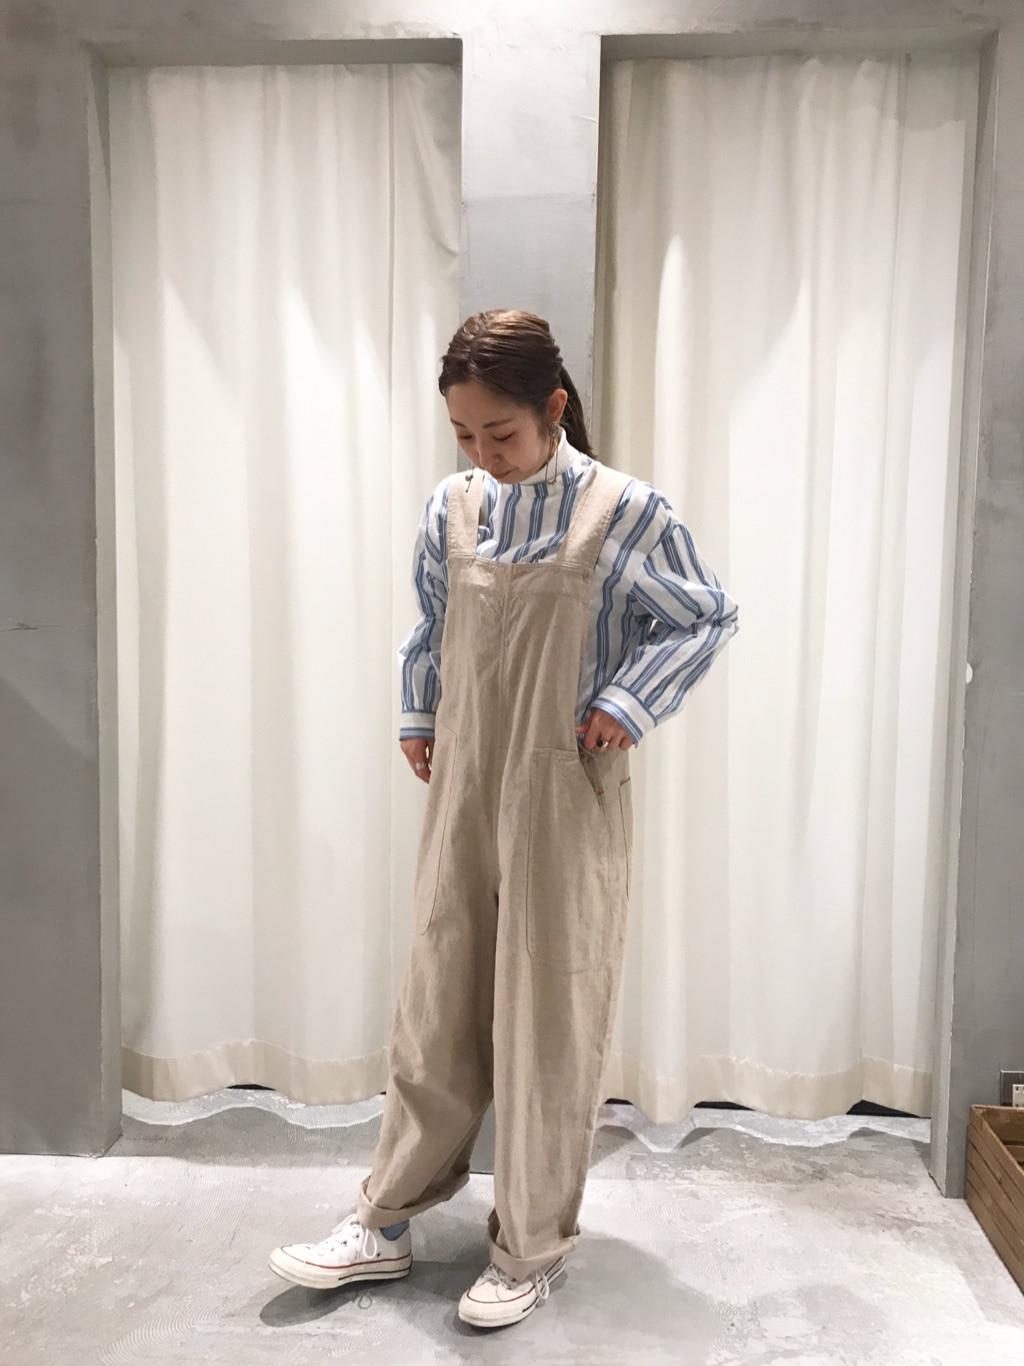 Dot and Stripes CHILD WOMAN ルミネ池袋 身長:155cm 2020.03.12